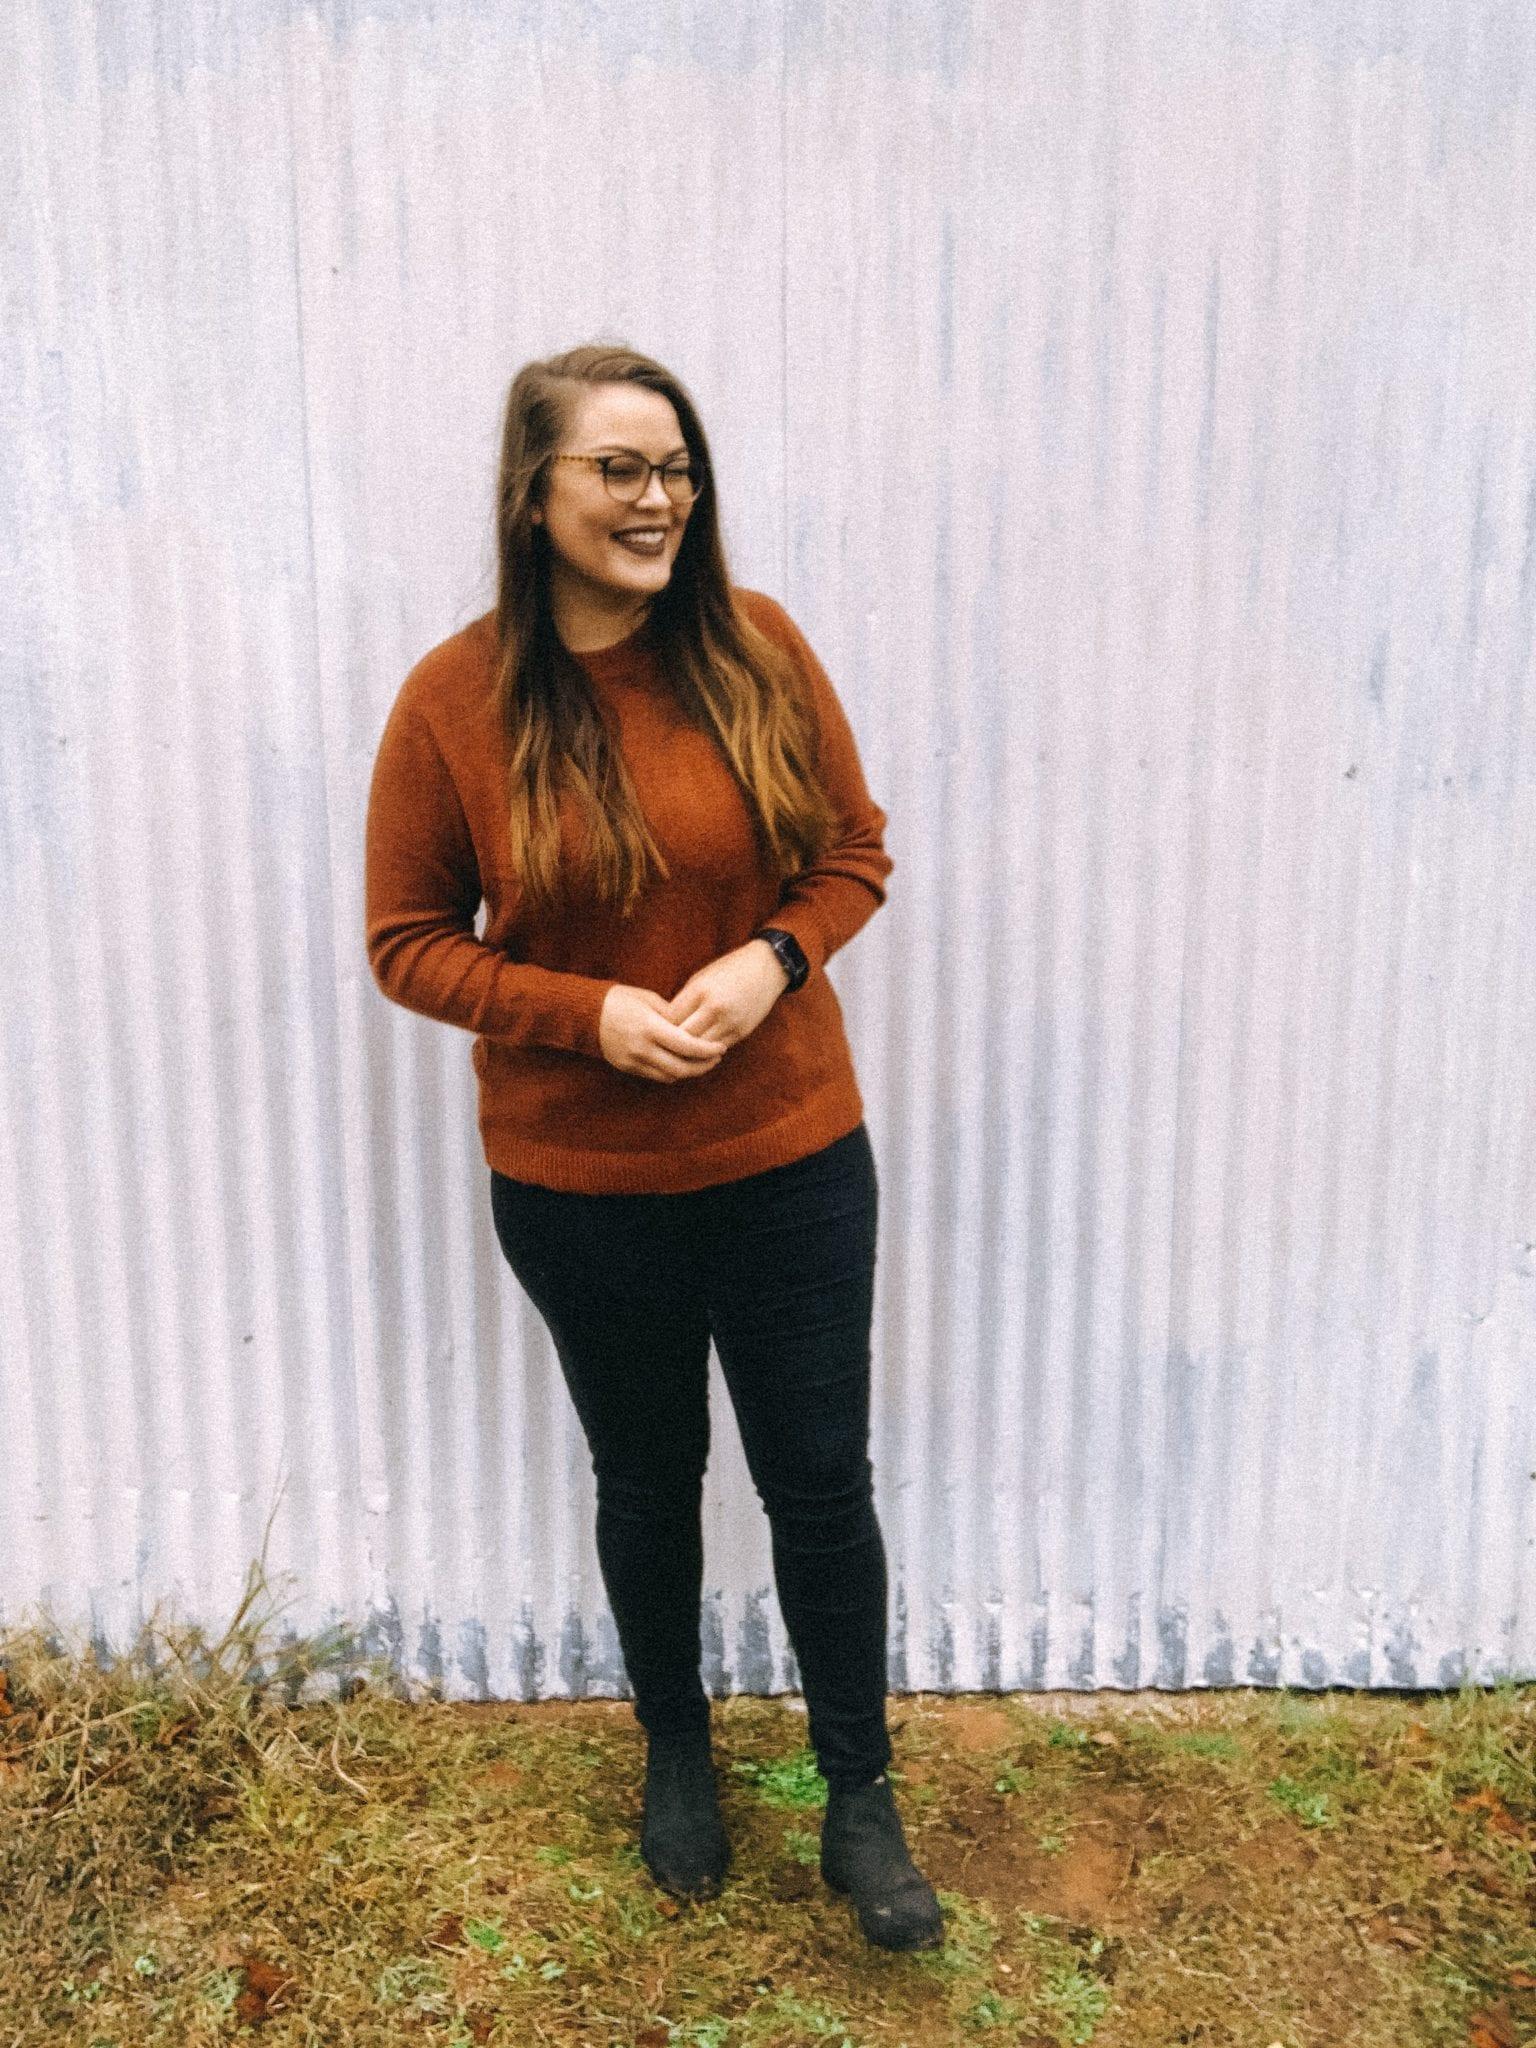 Braidyn standing in front of a barn door, smiling.